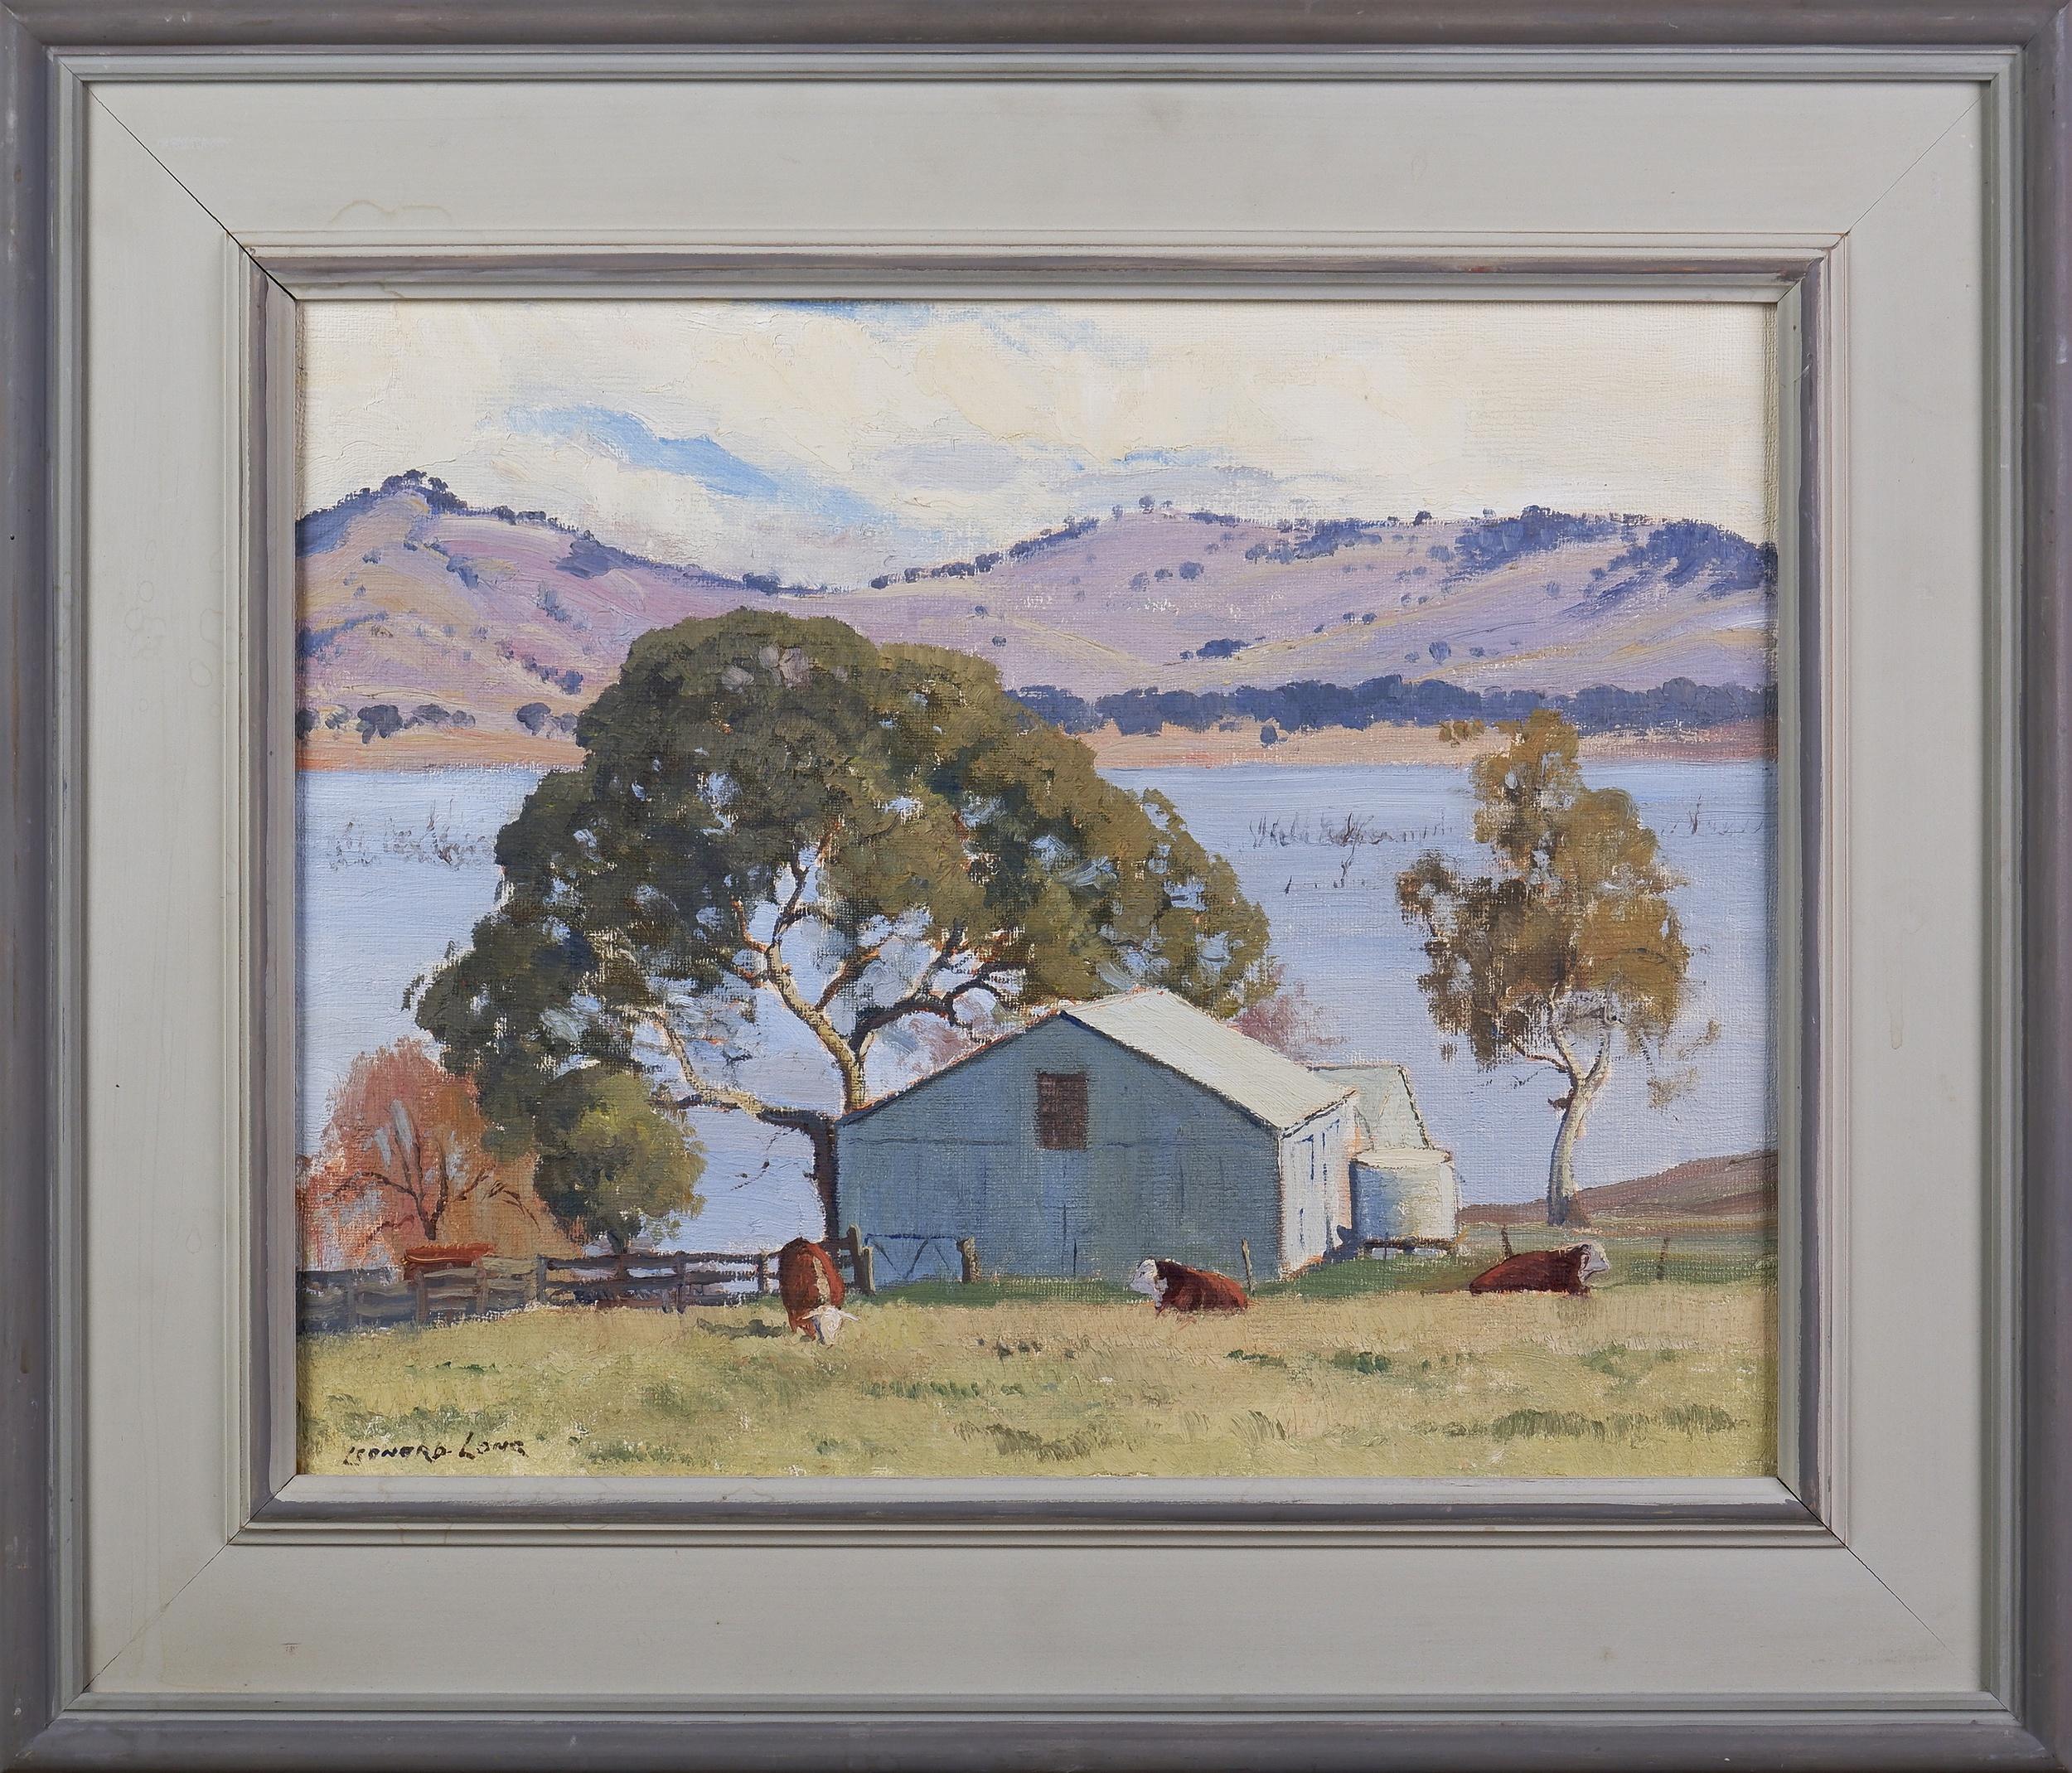 'Leonard Long (1911-2013), The Bull Paddock, Bethanga, Oil on Artists Board, 29 x 37 cm'